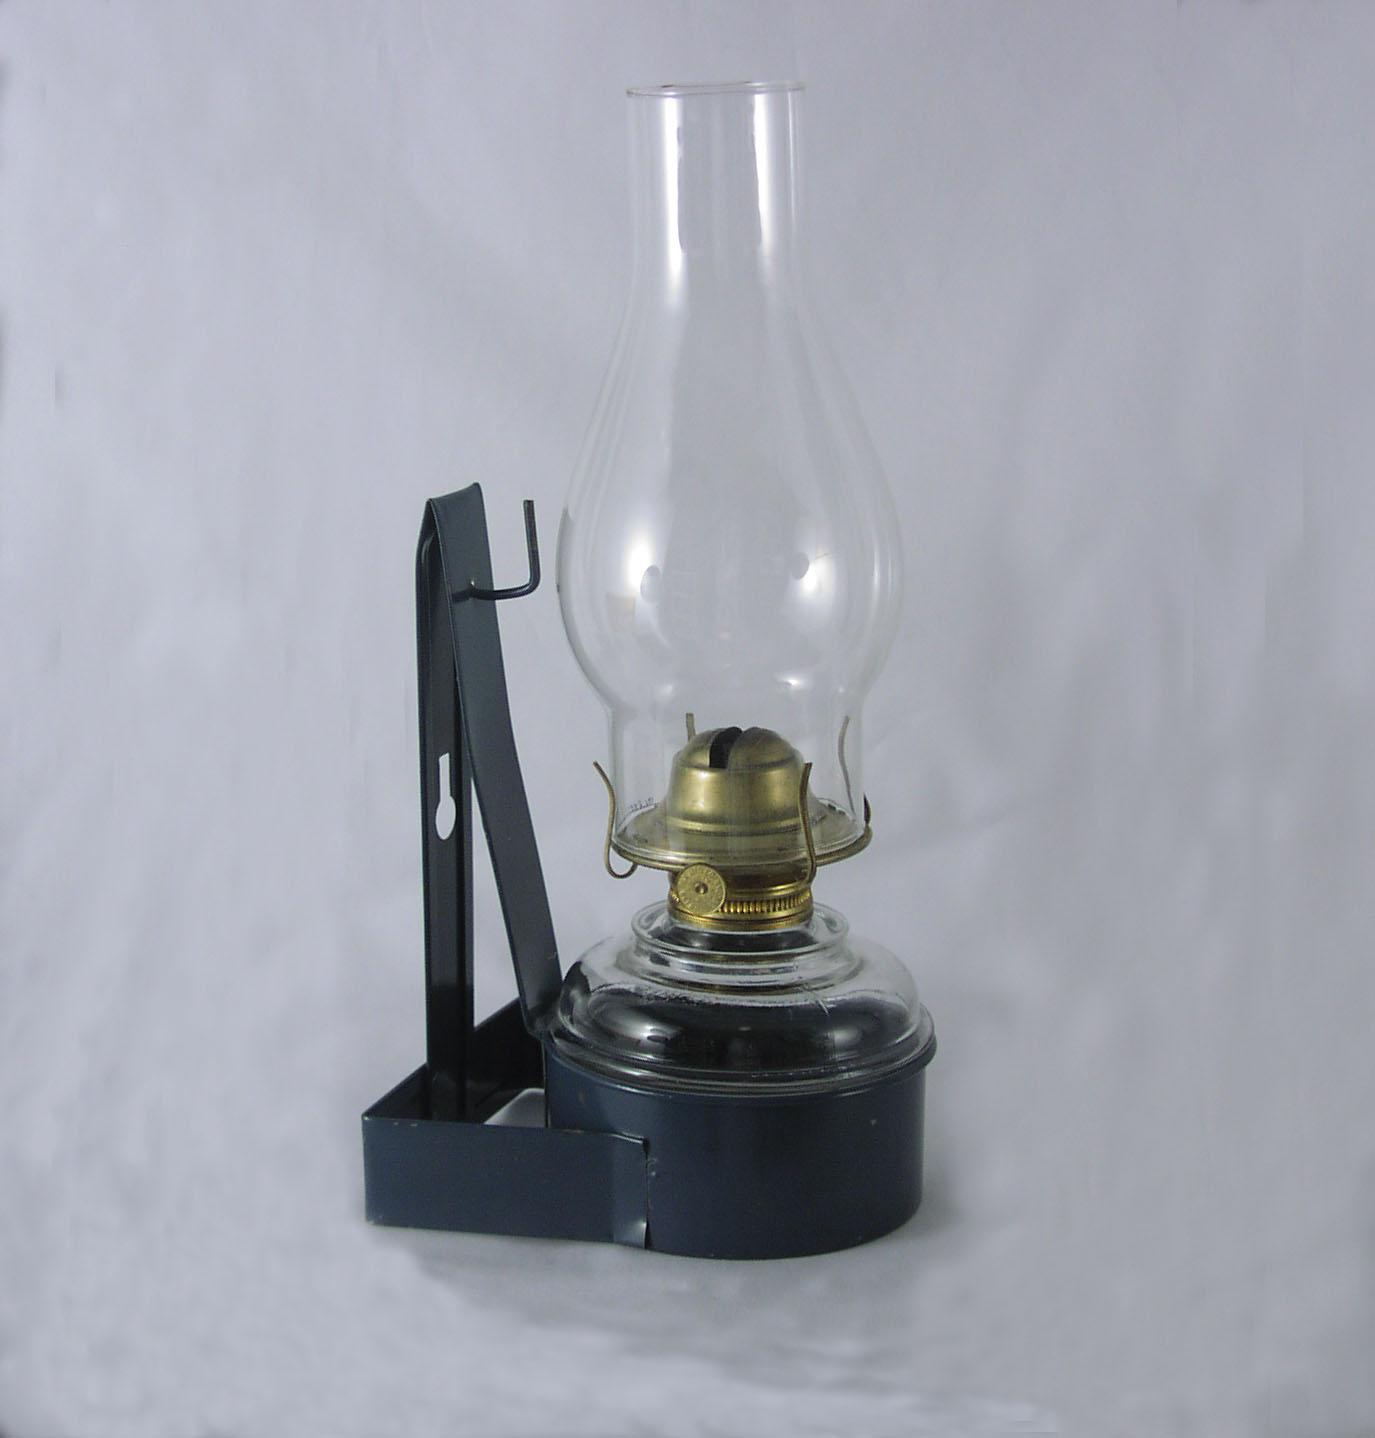 Image - Lampe